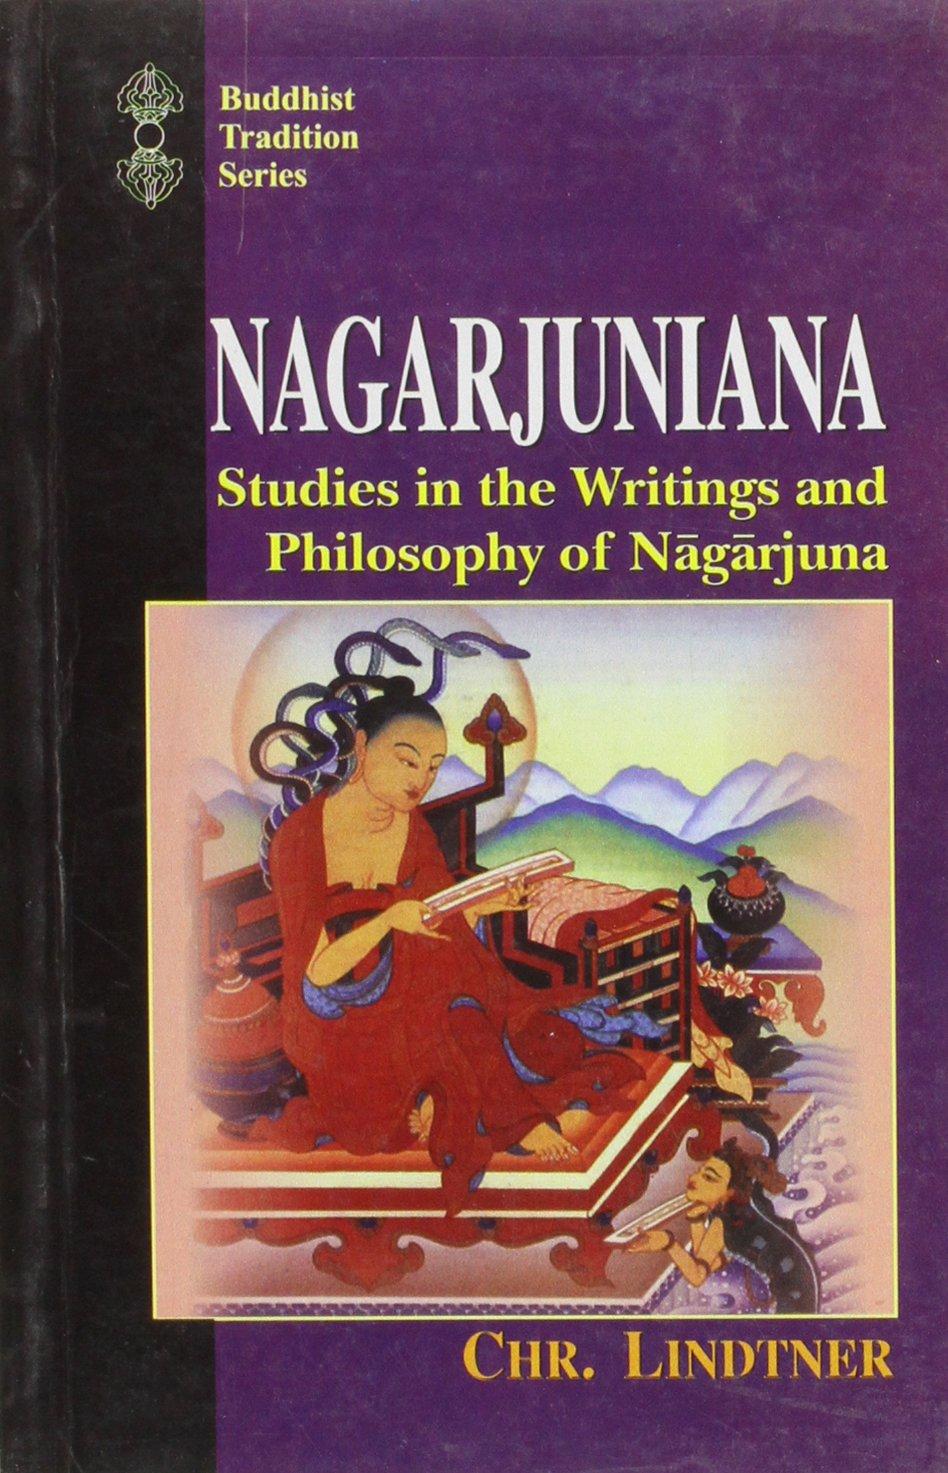 Lindtner Nagarjuniana cover art